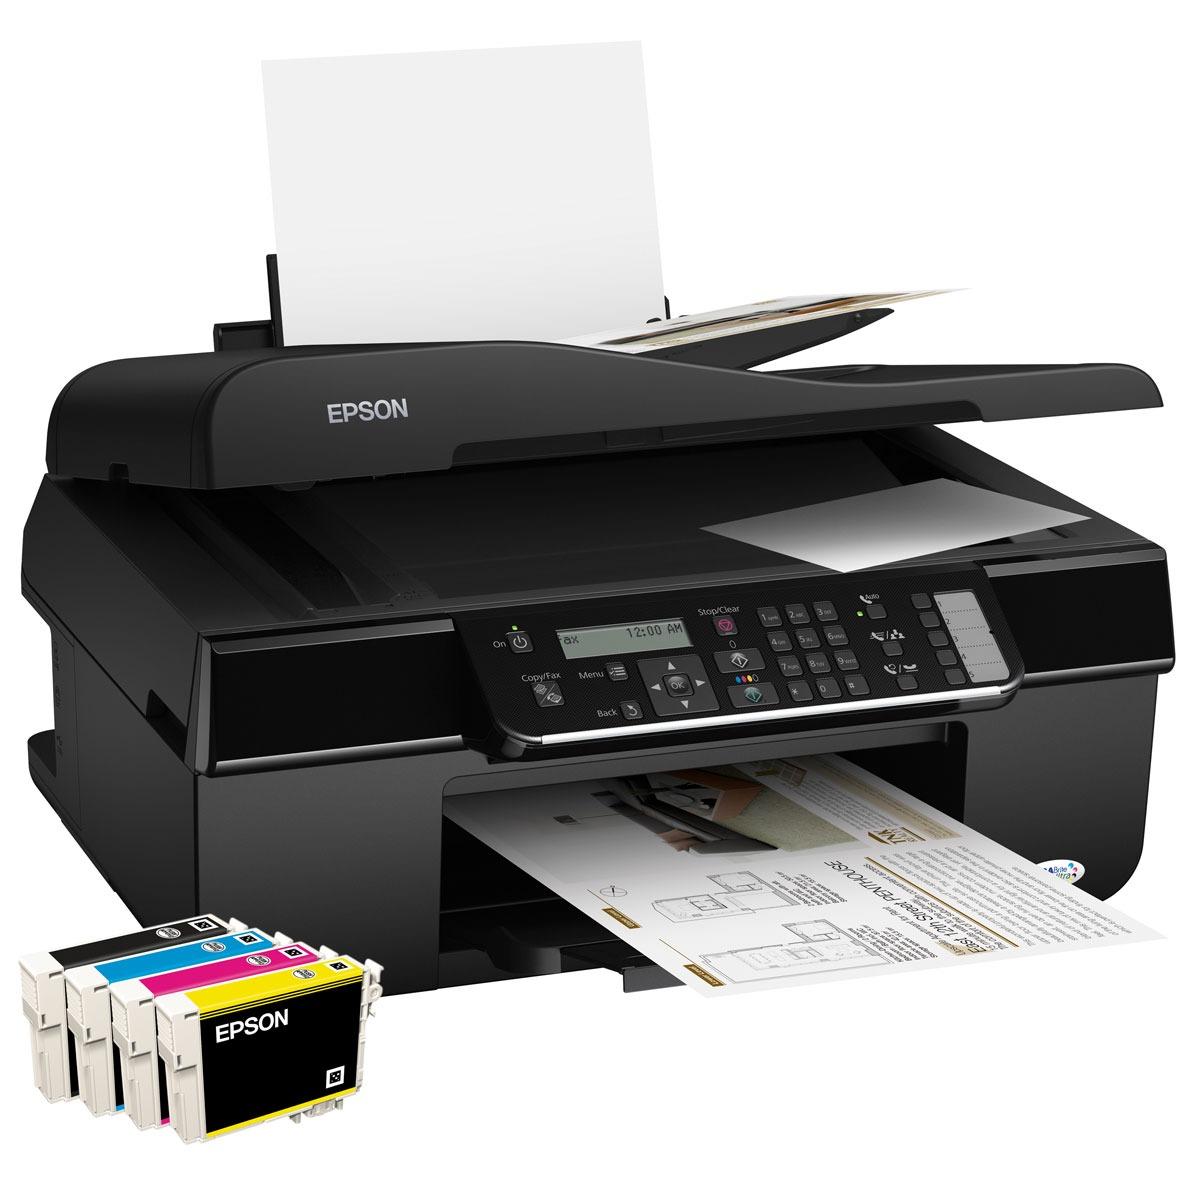 epson stylus office bx305fw imprimante multifonction. Black Bedroom Furniture Sets. Home Design Ideas